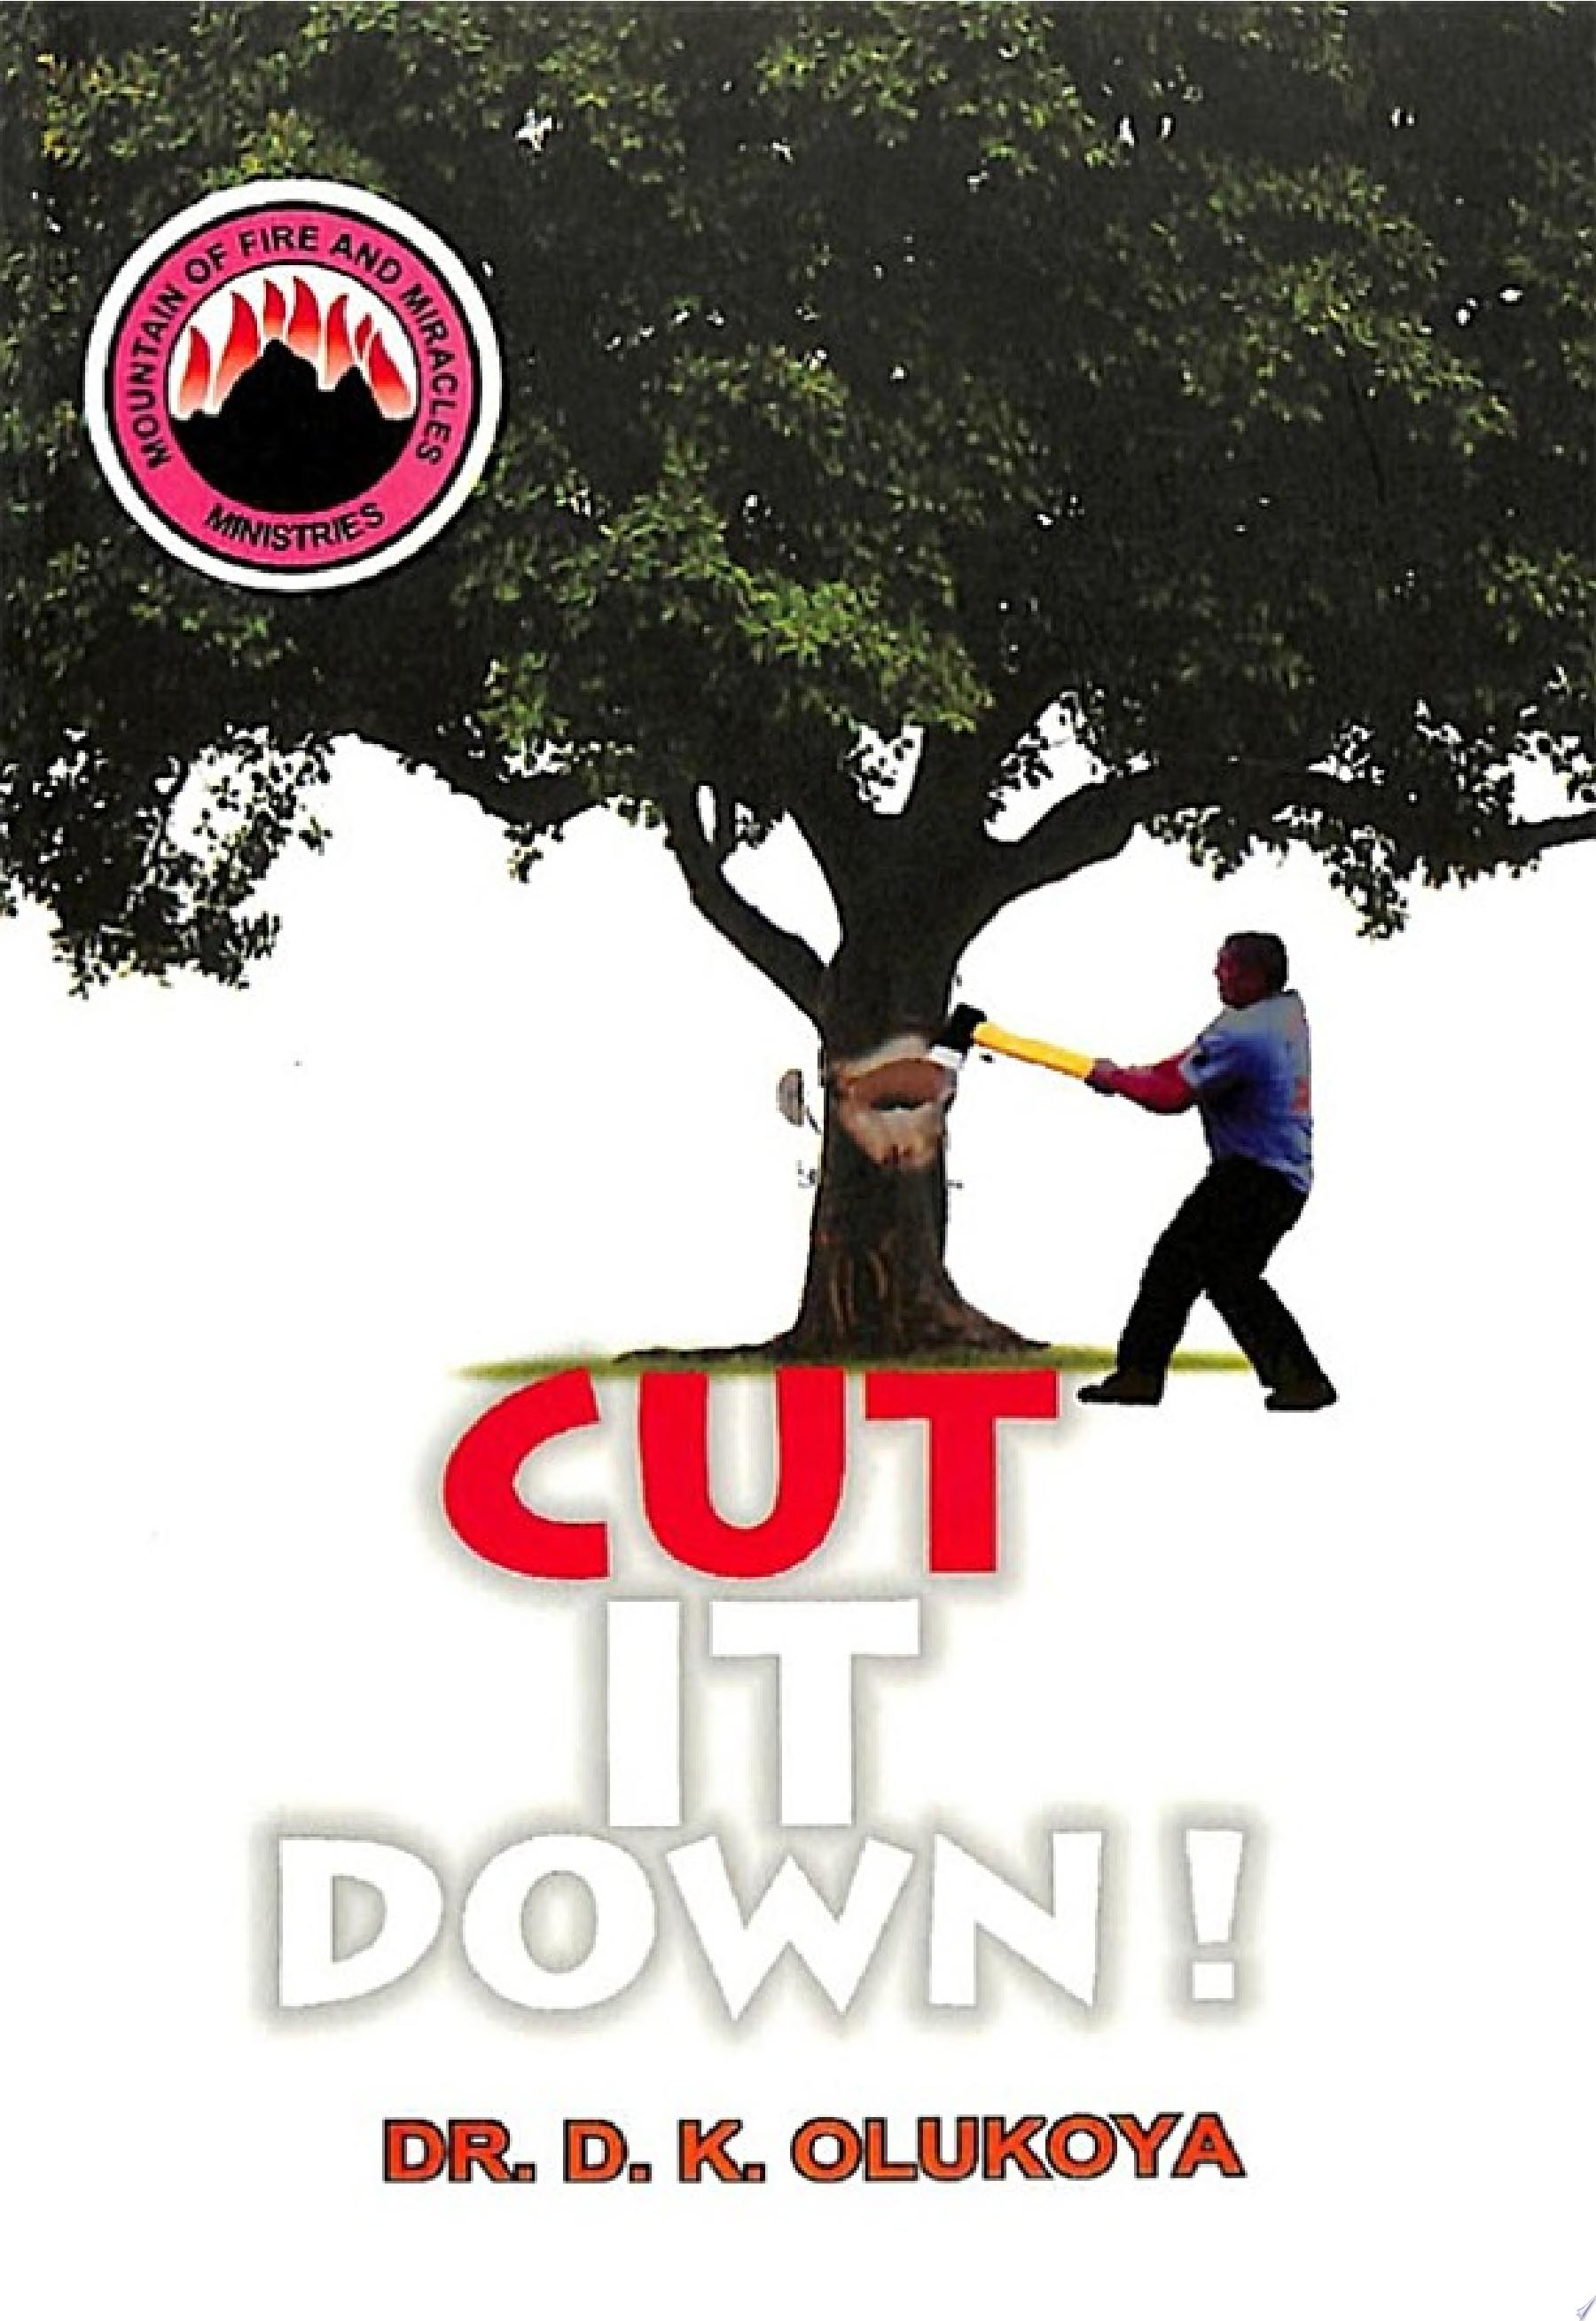 Cut it down